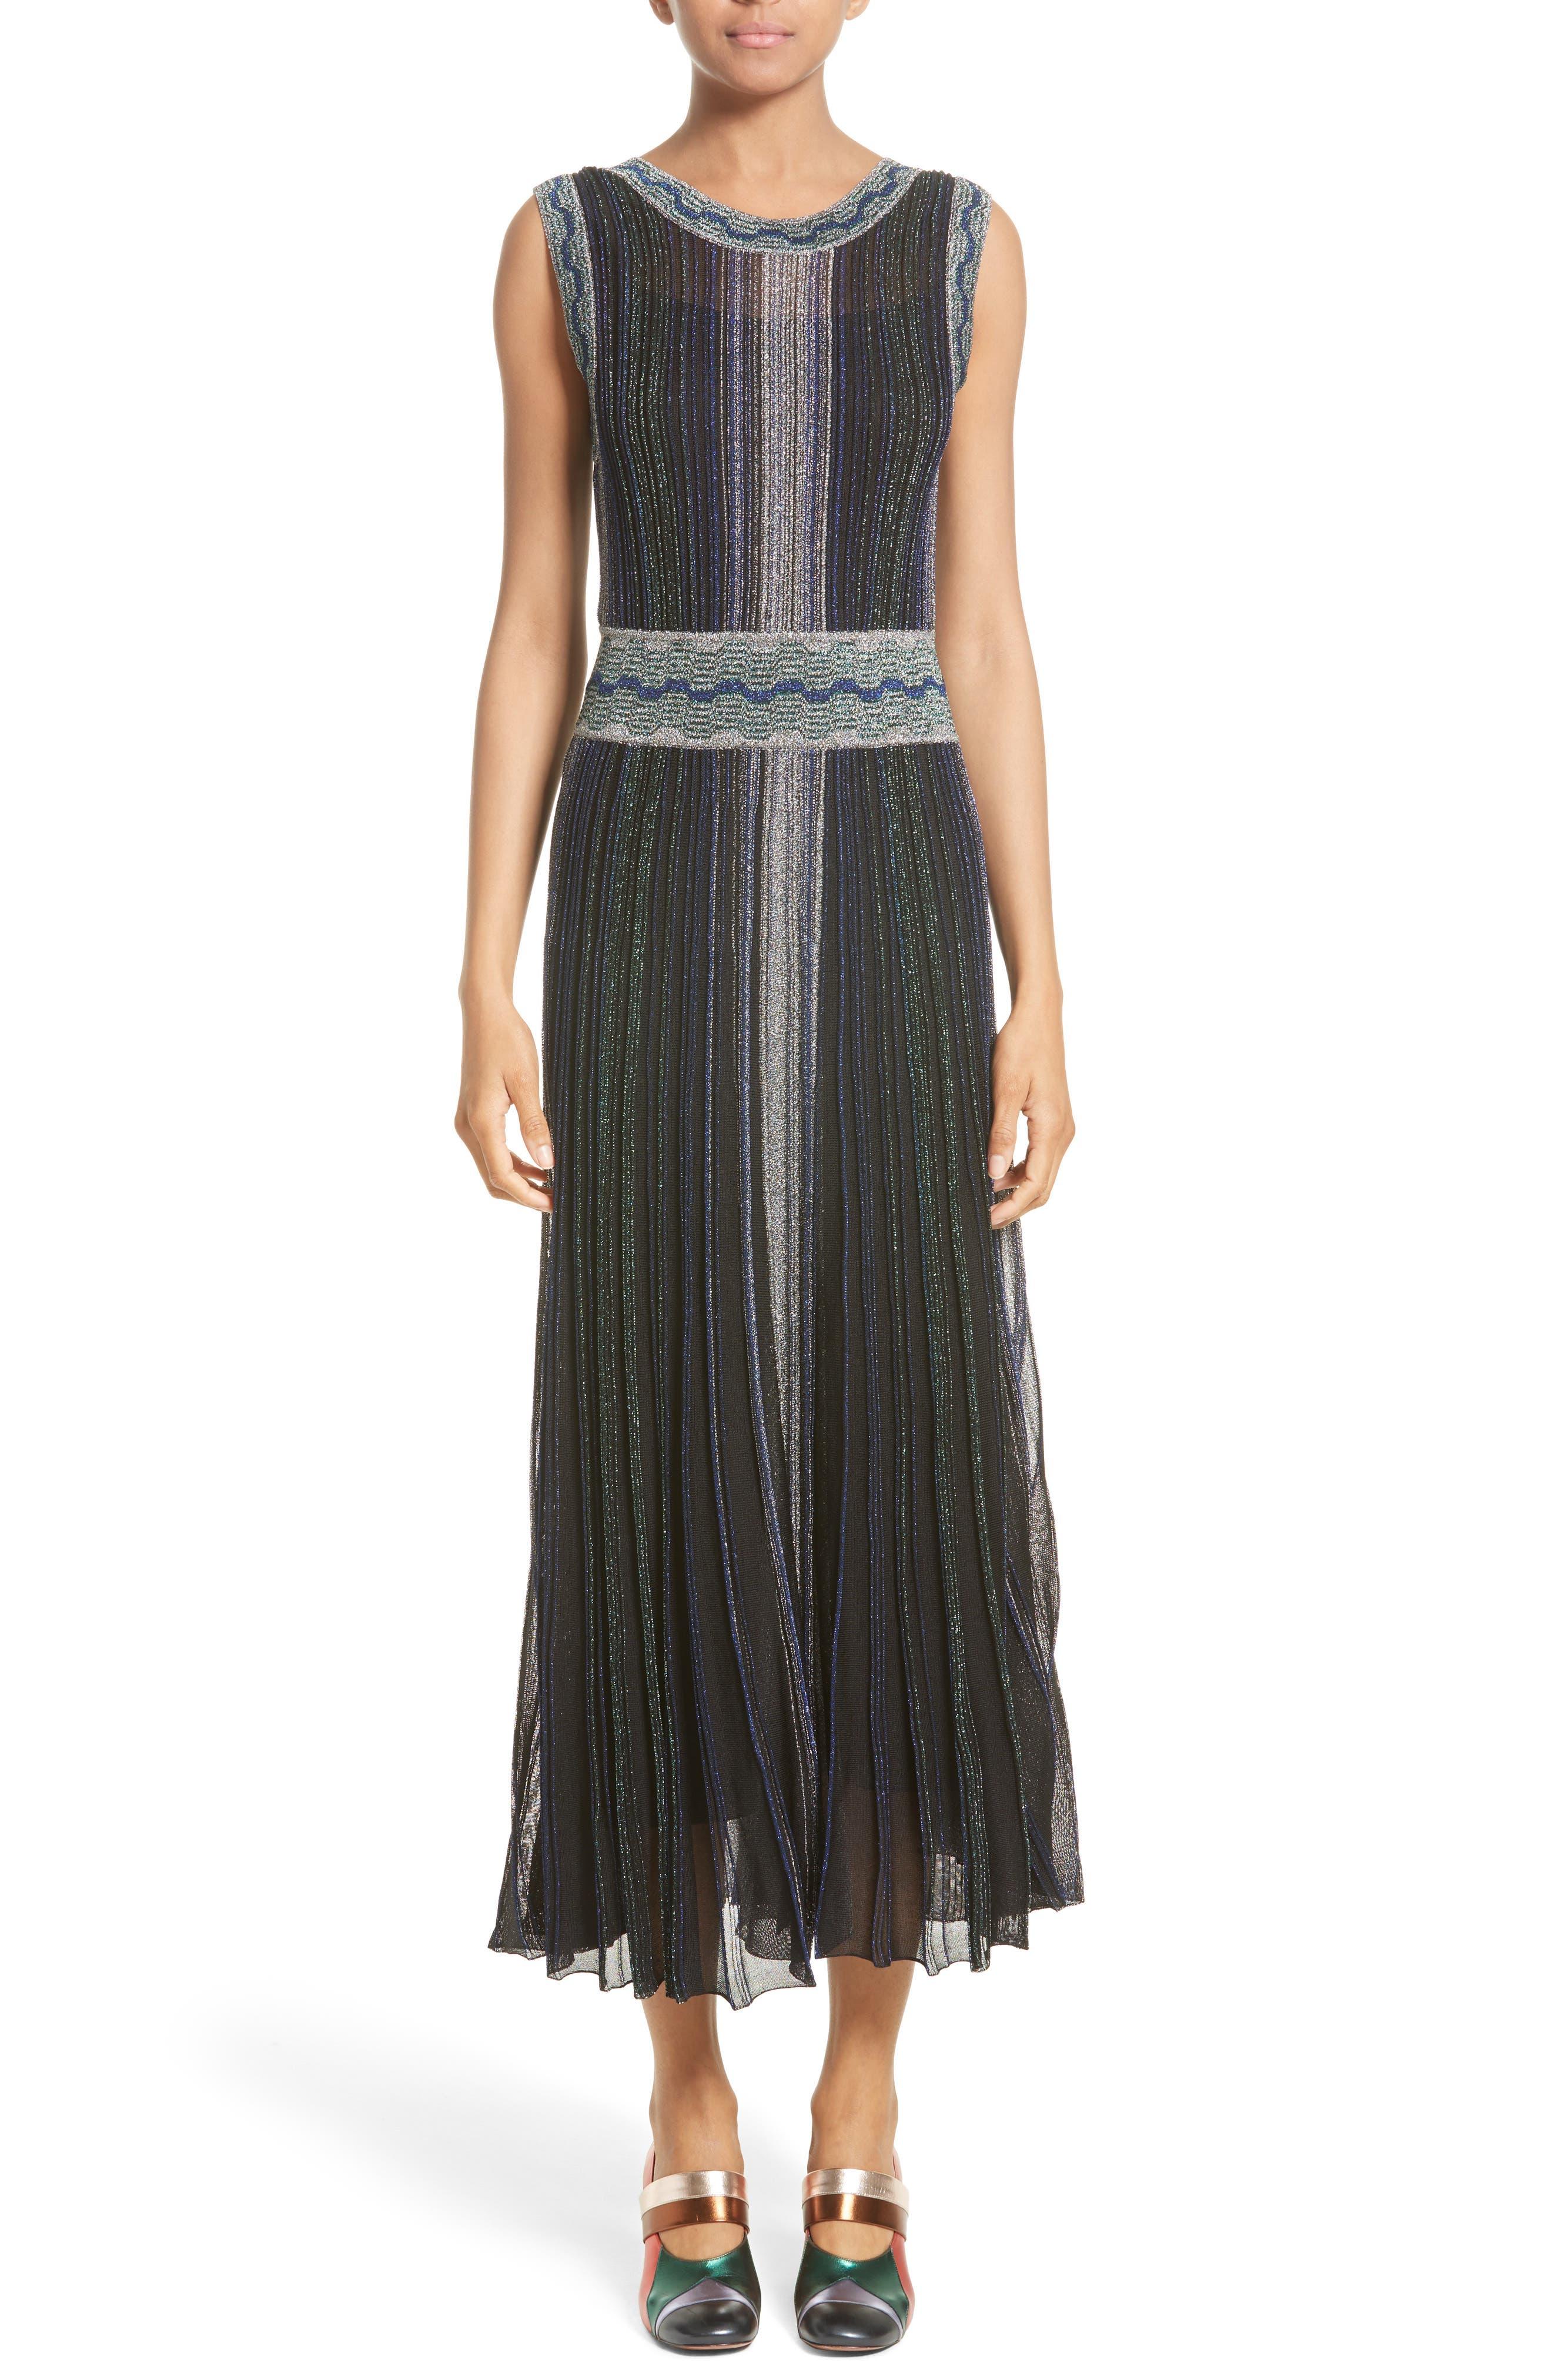 Alternate Image 1 Selected - Missoni Reversible Metallic Rib Knit Dress